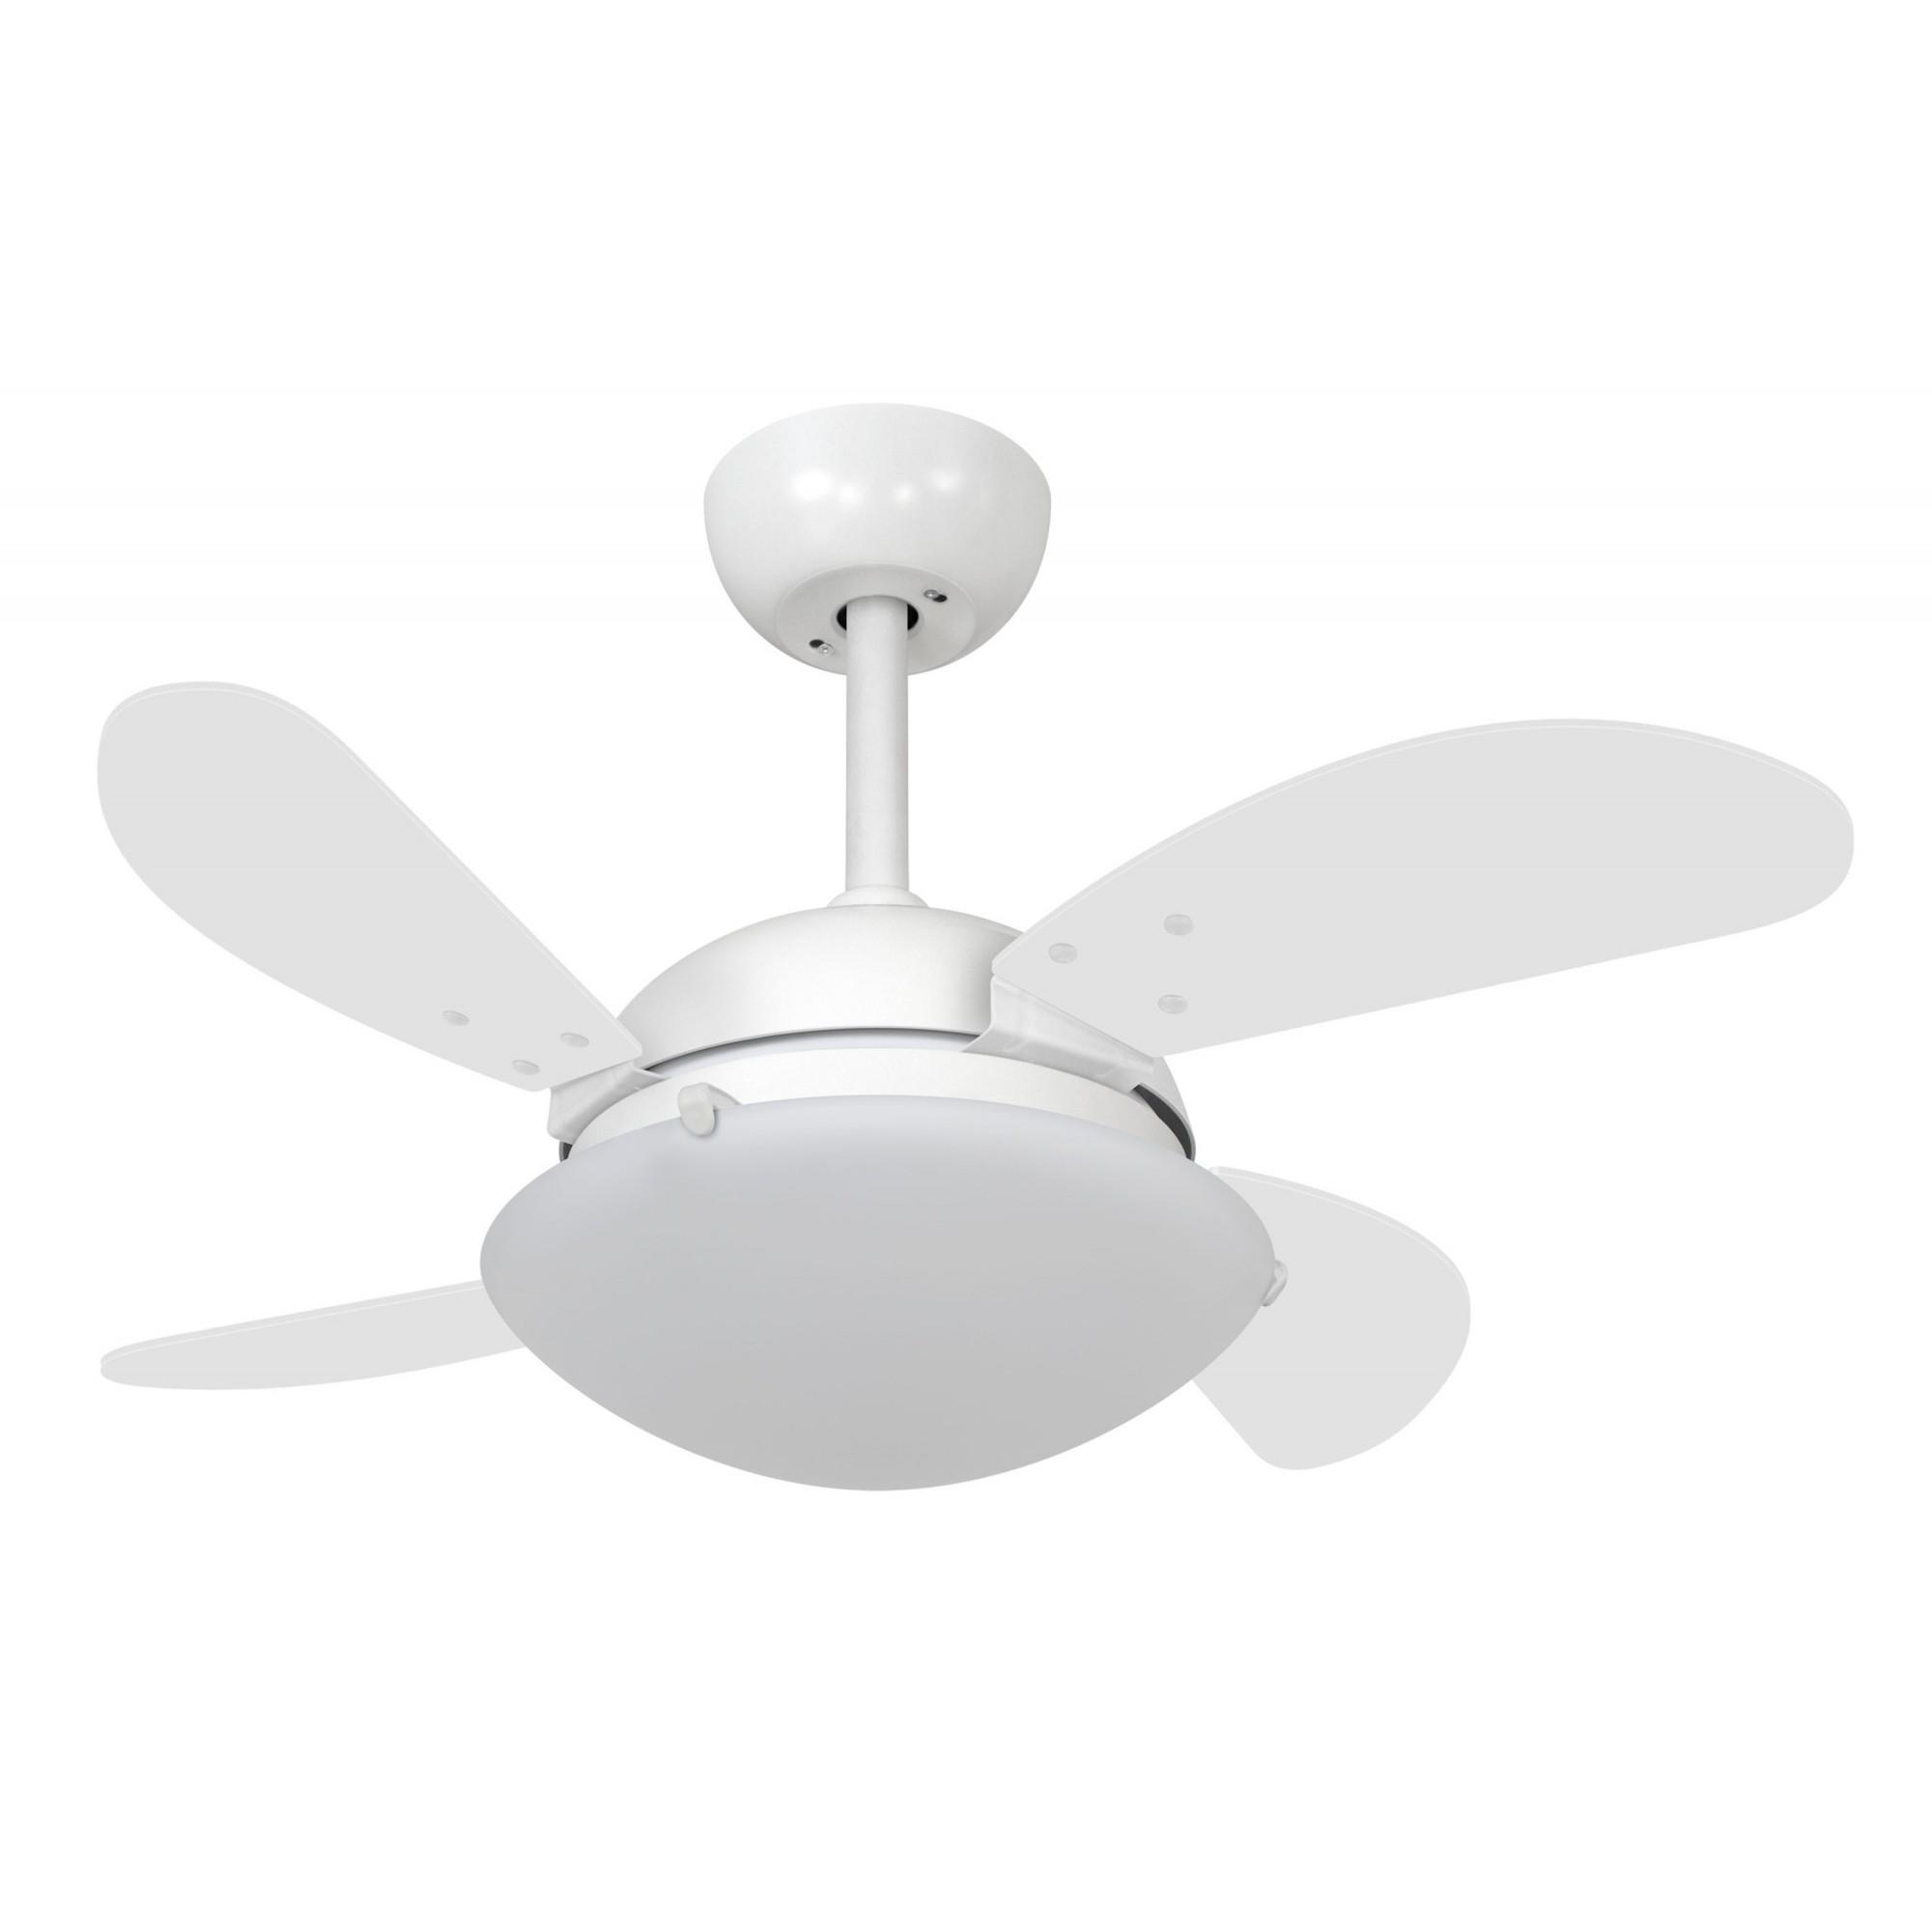 Ventilador de Teto VD300 Mini Fly Branco 4Pás MDF 220V